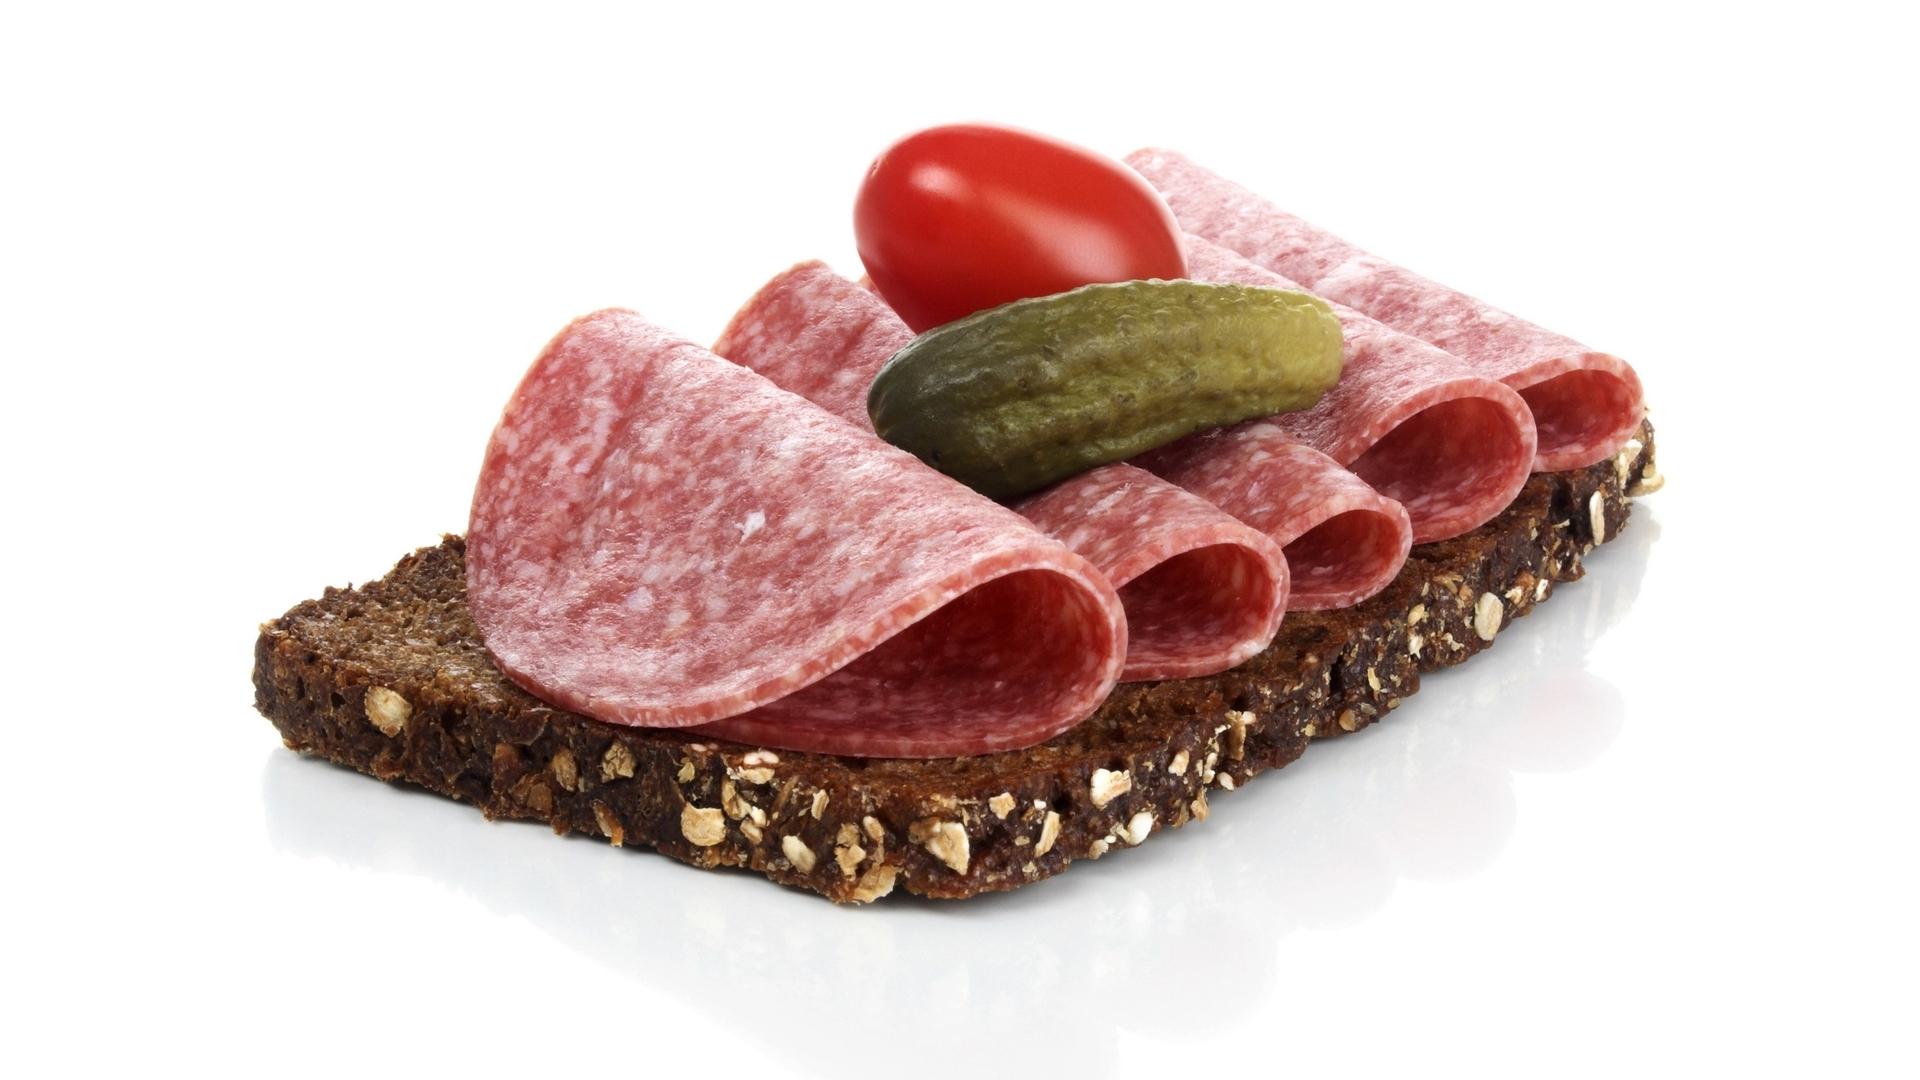 бутерброд фото с колбасой